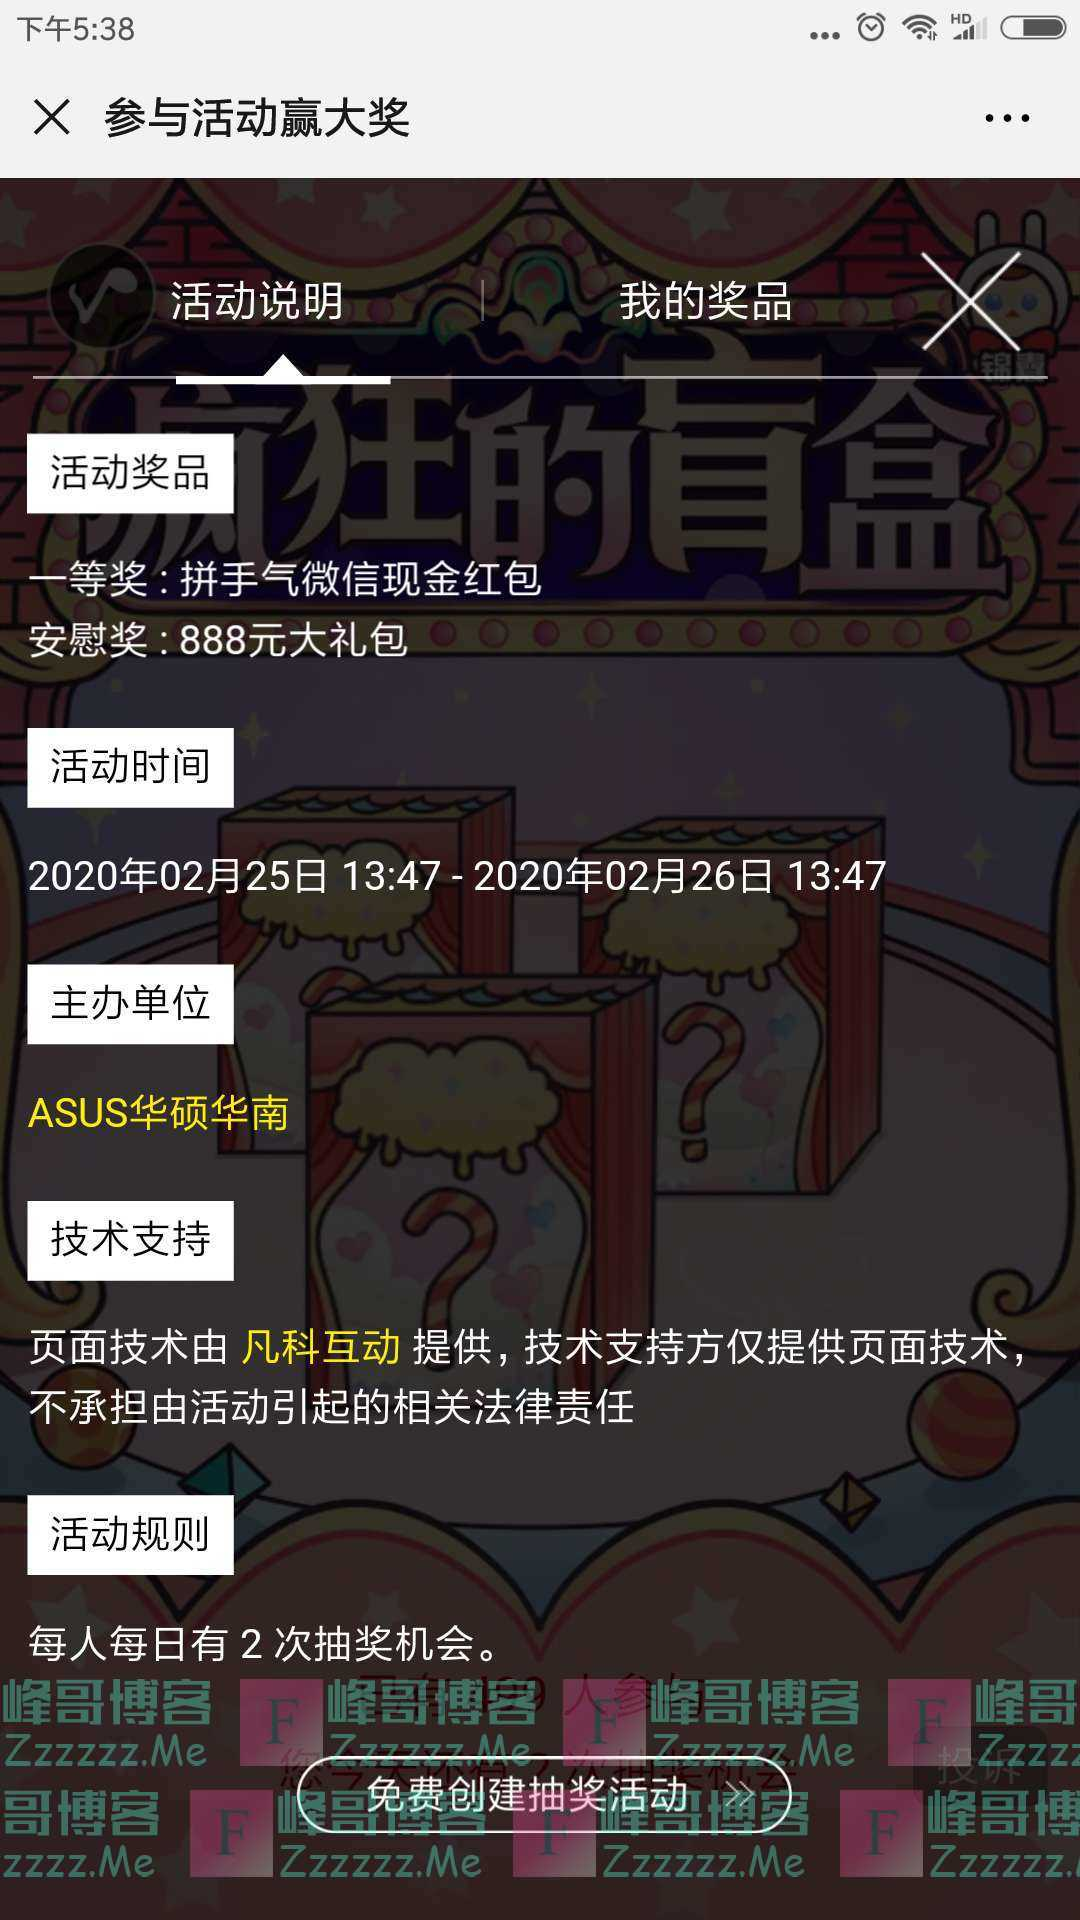 ASUS华硕东南快乐宅家游戏互动(截止2月26日)